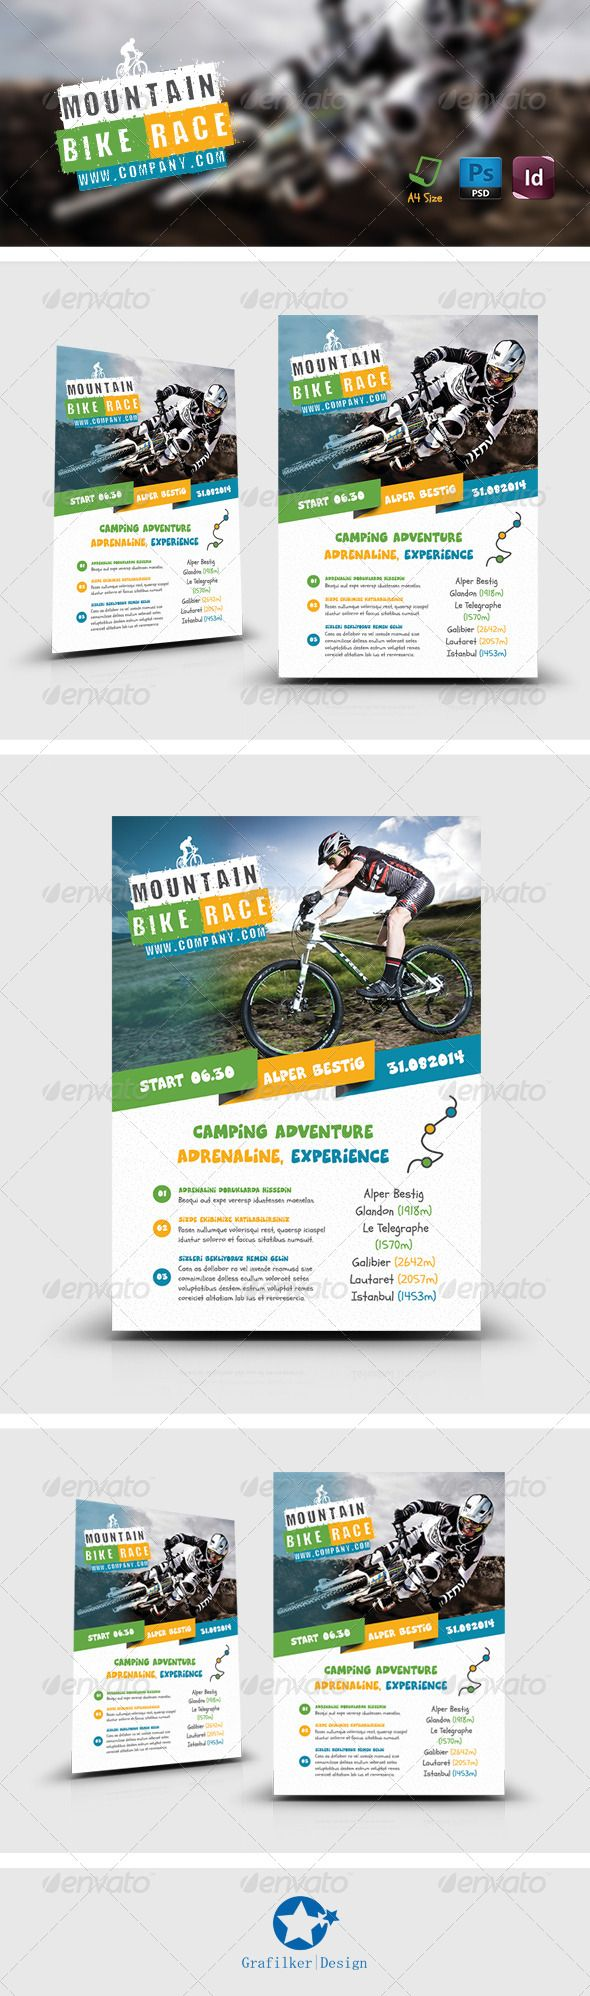 Bicycle Racing Flyer Templates   Soccer, Parasailing and Tent